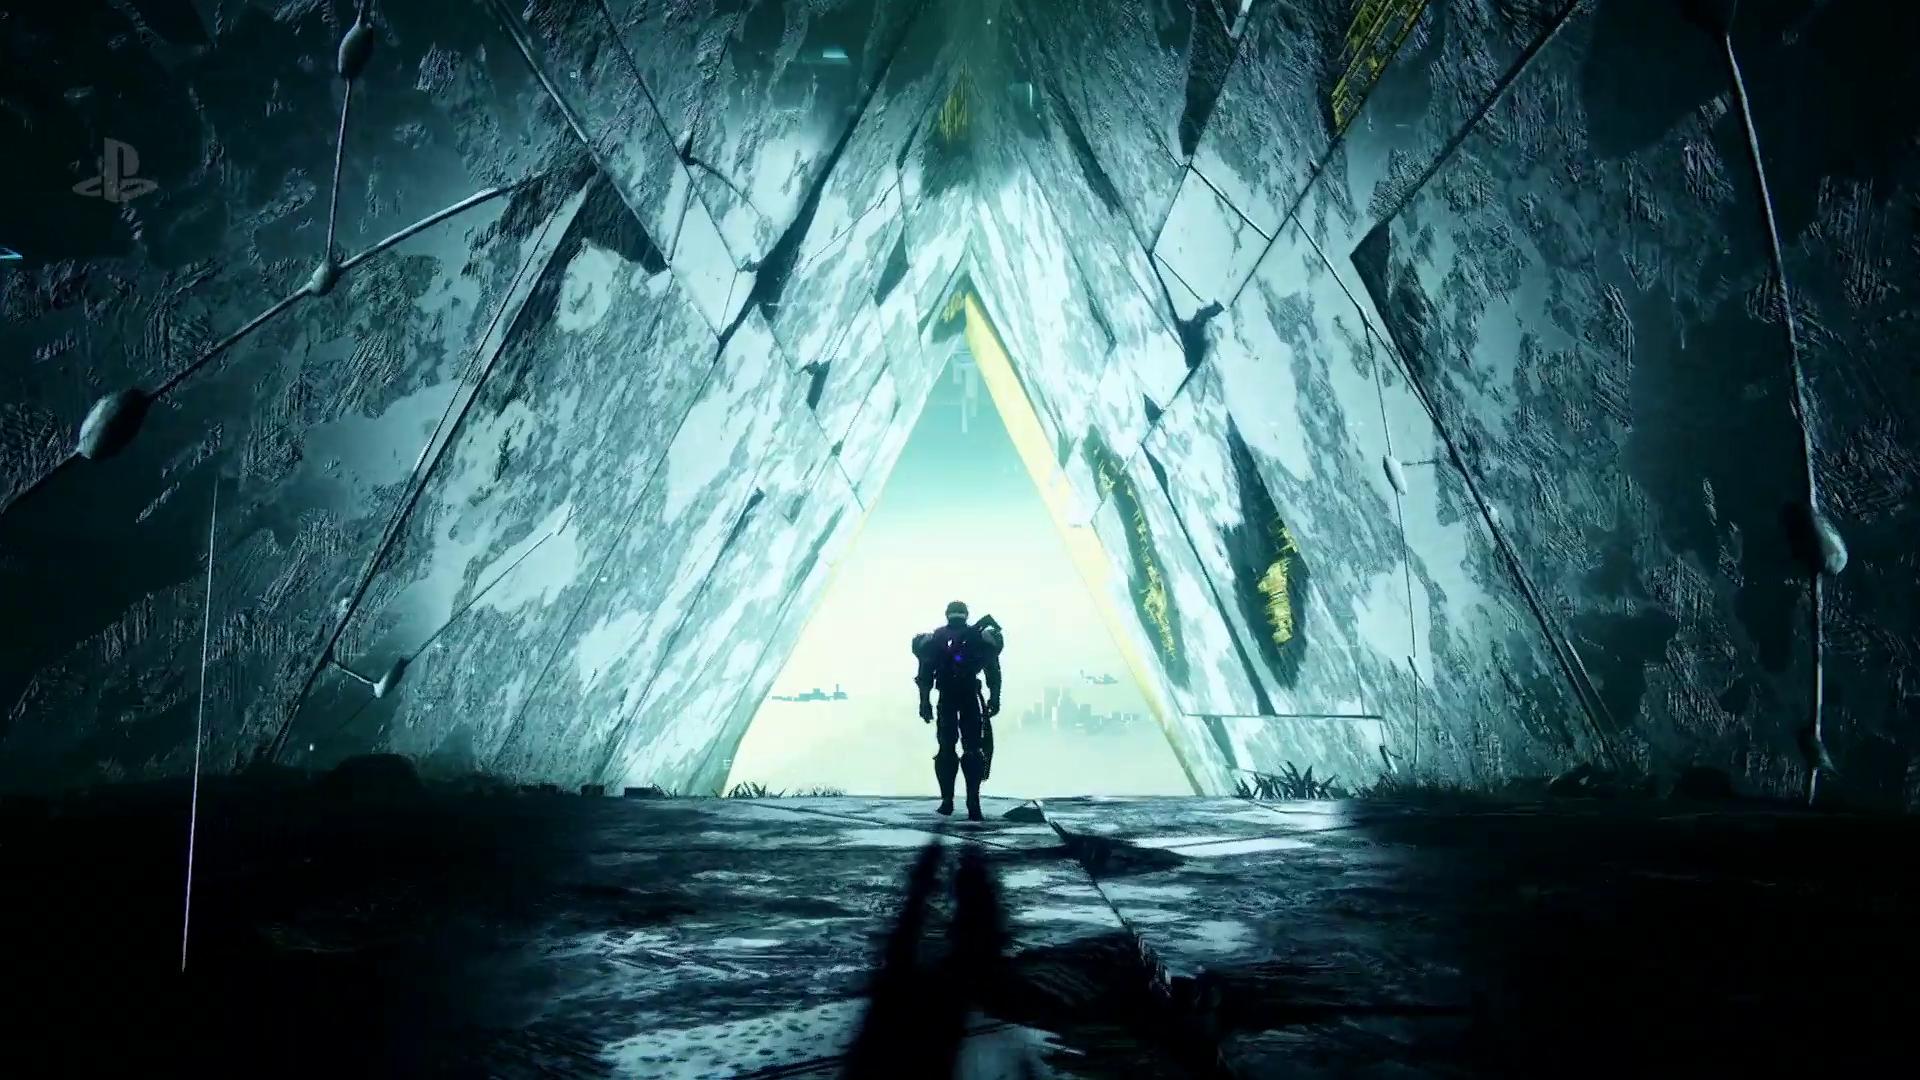 Destiny 2's next season starts Dec. 10, and finally nerfs two hated items